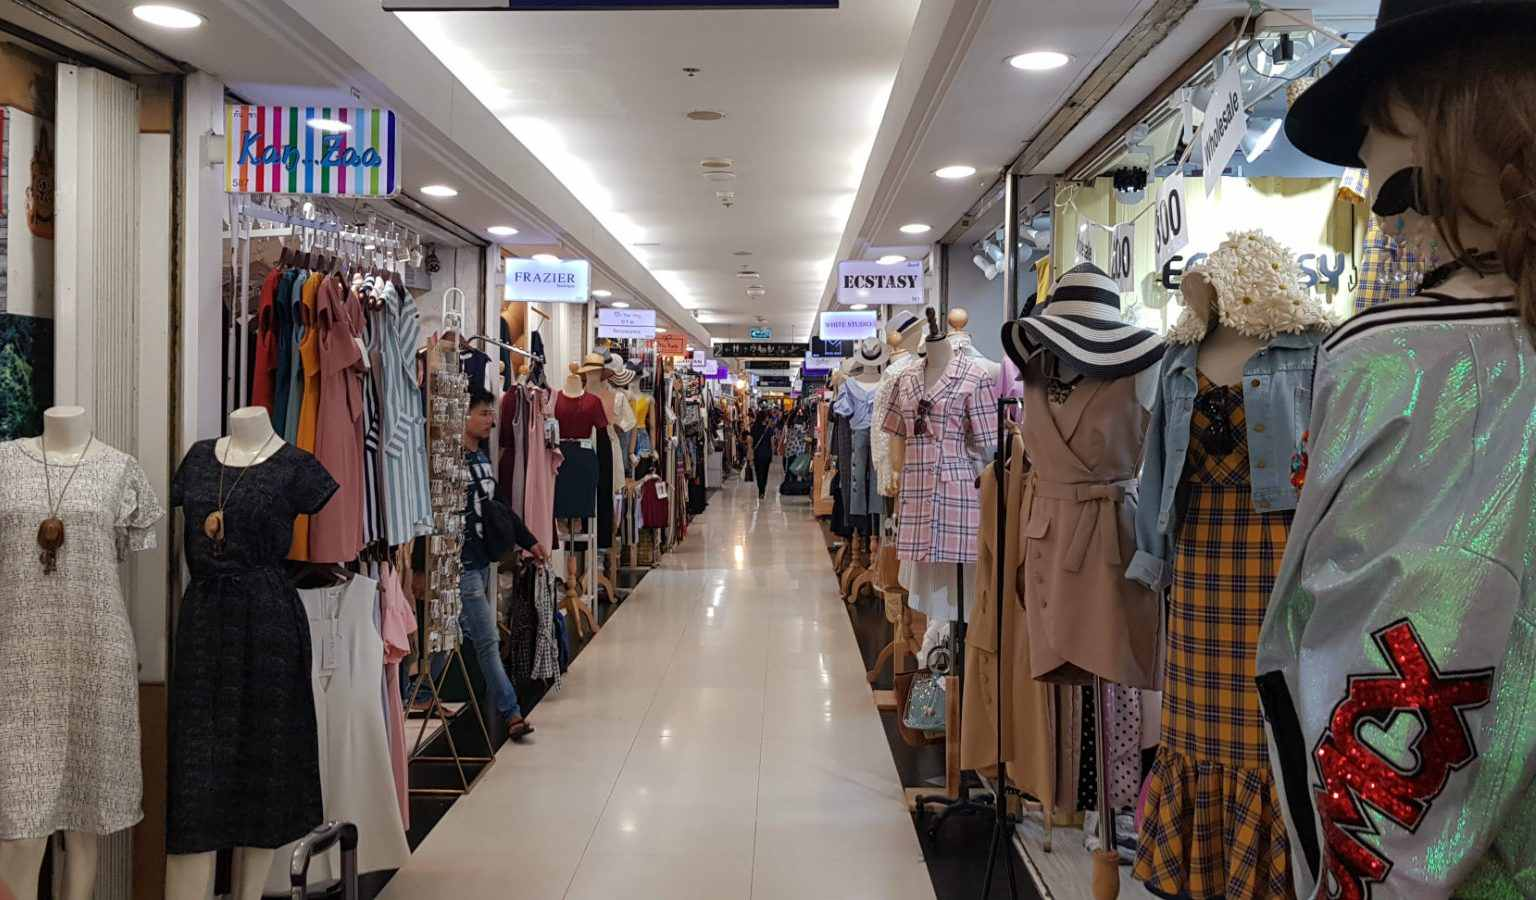 Lange gang met met aan weerszijde kleine kledingwinkeltjes in Platinum Fashion Mall in Bangkok